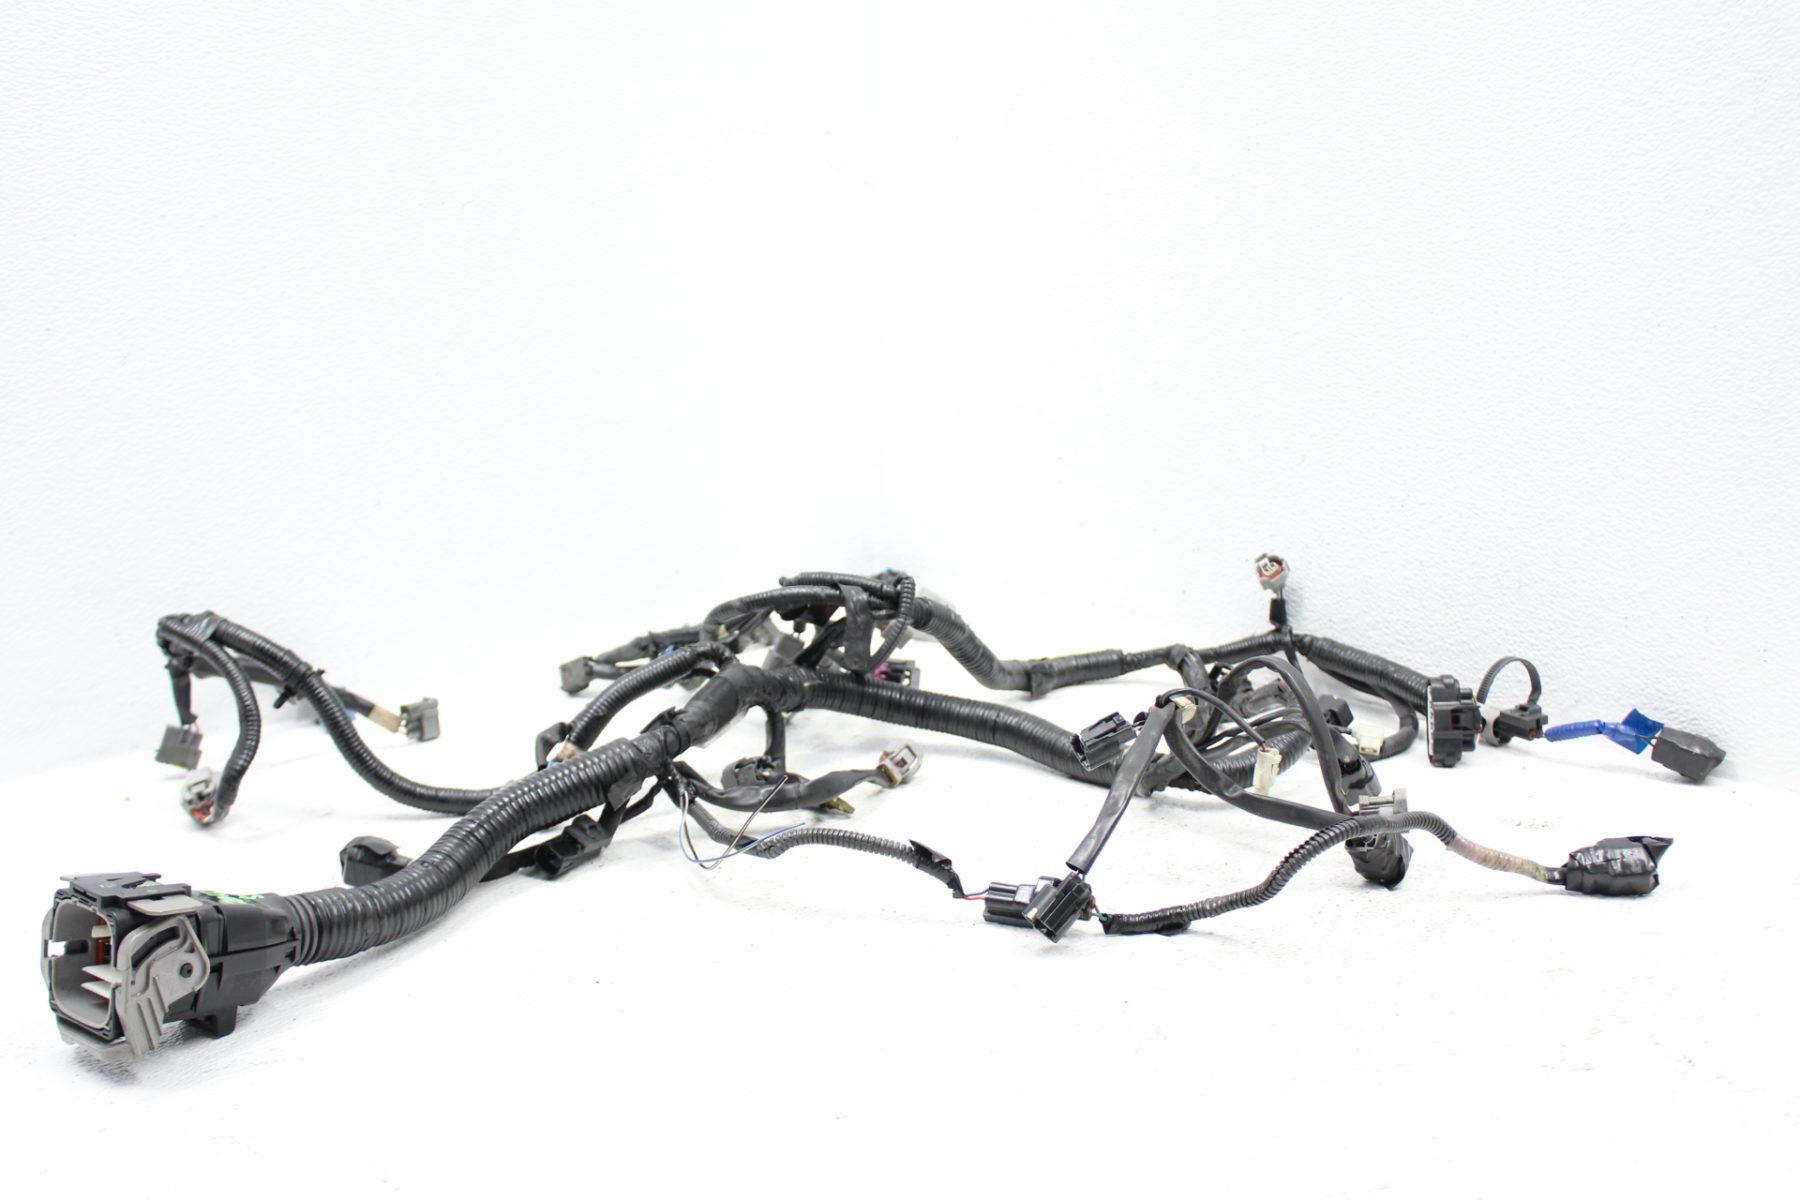 Subaru Wrx Sti Engine Motor Wiring Harness Oem